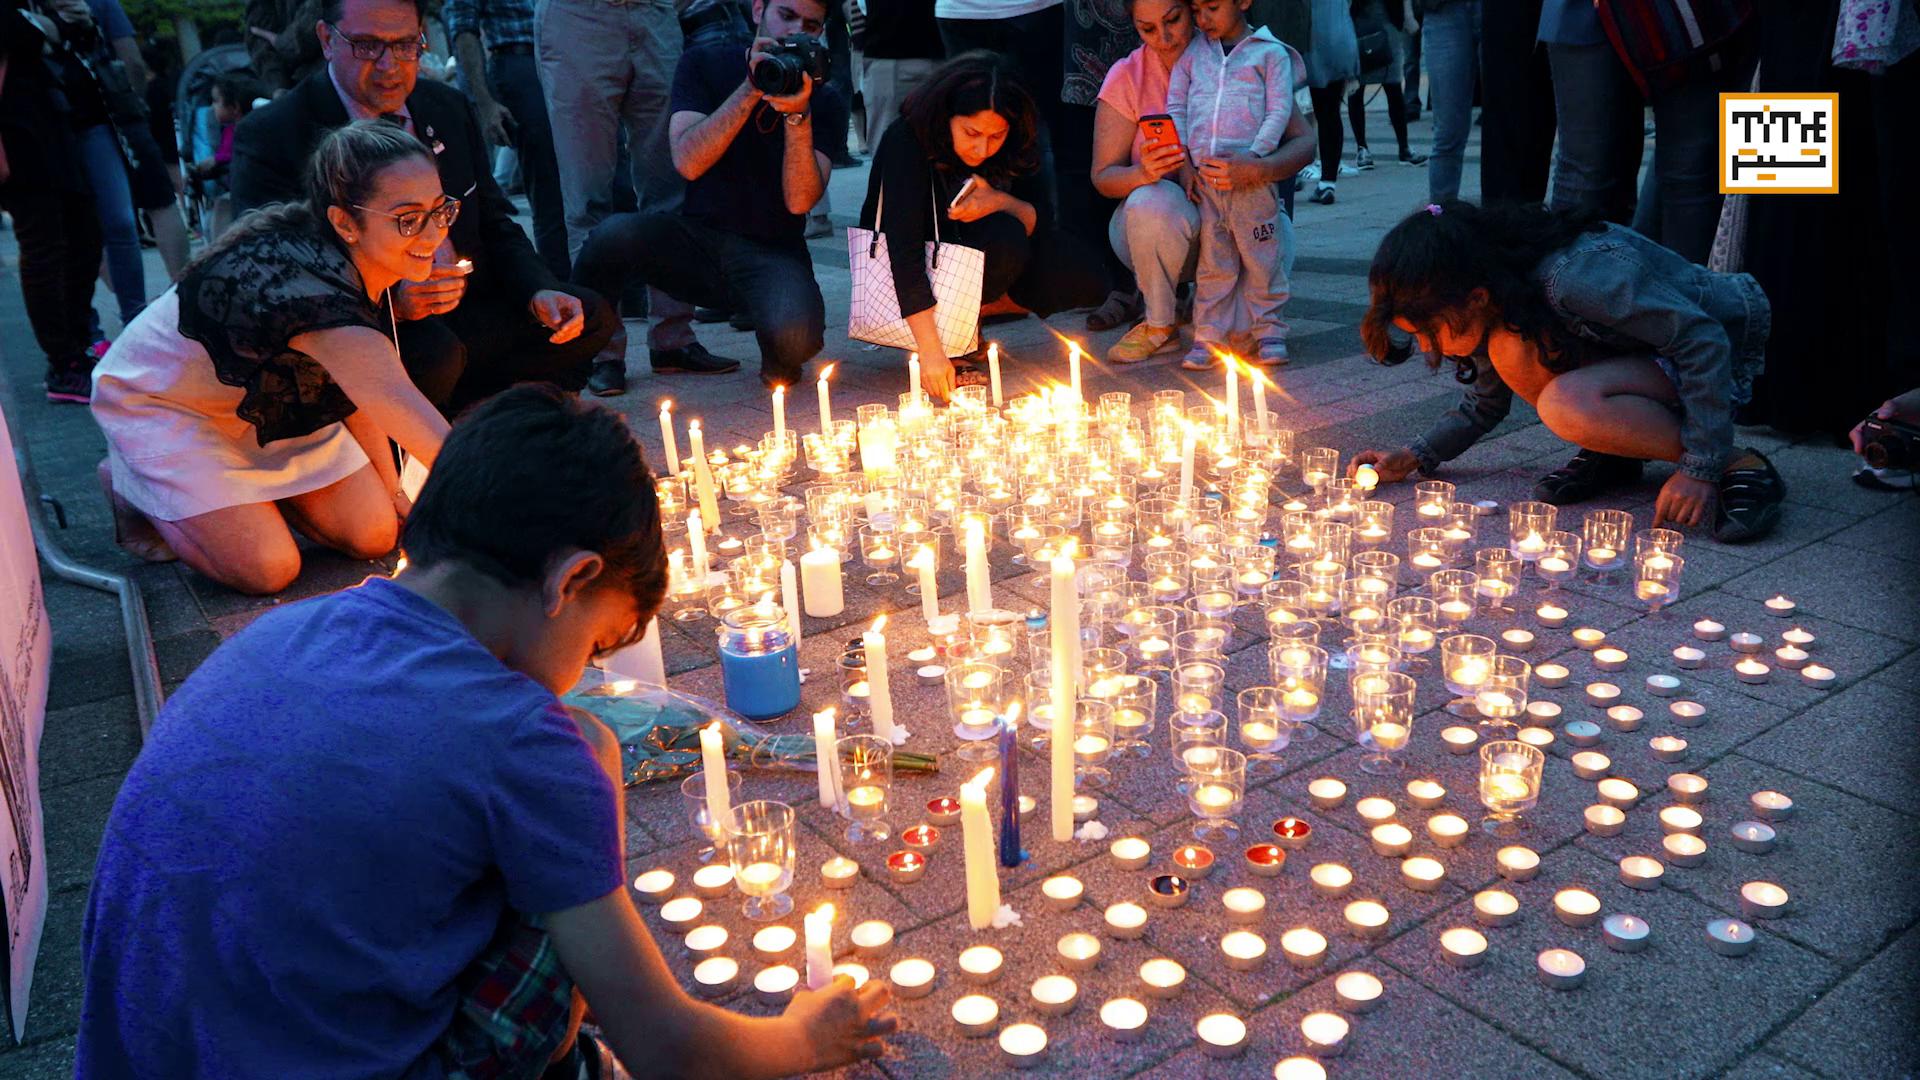 Photo of ایرانیان تورنتو برای قربانیان تهران شمع روشن کردند